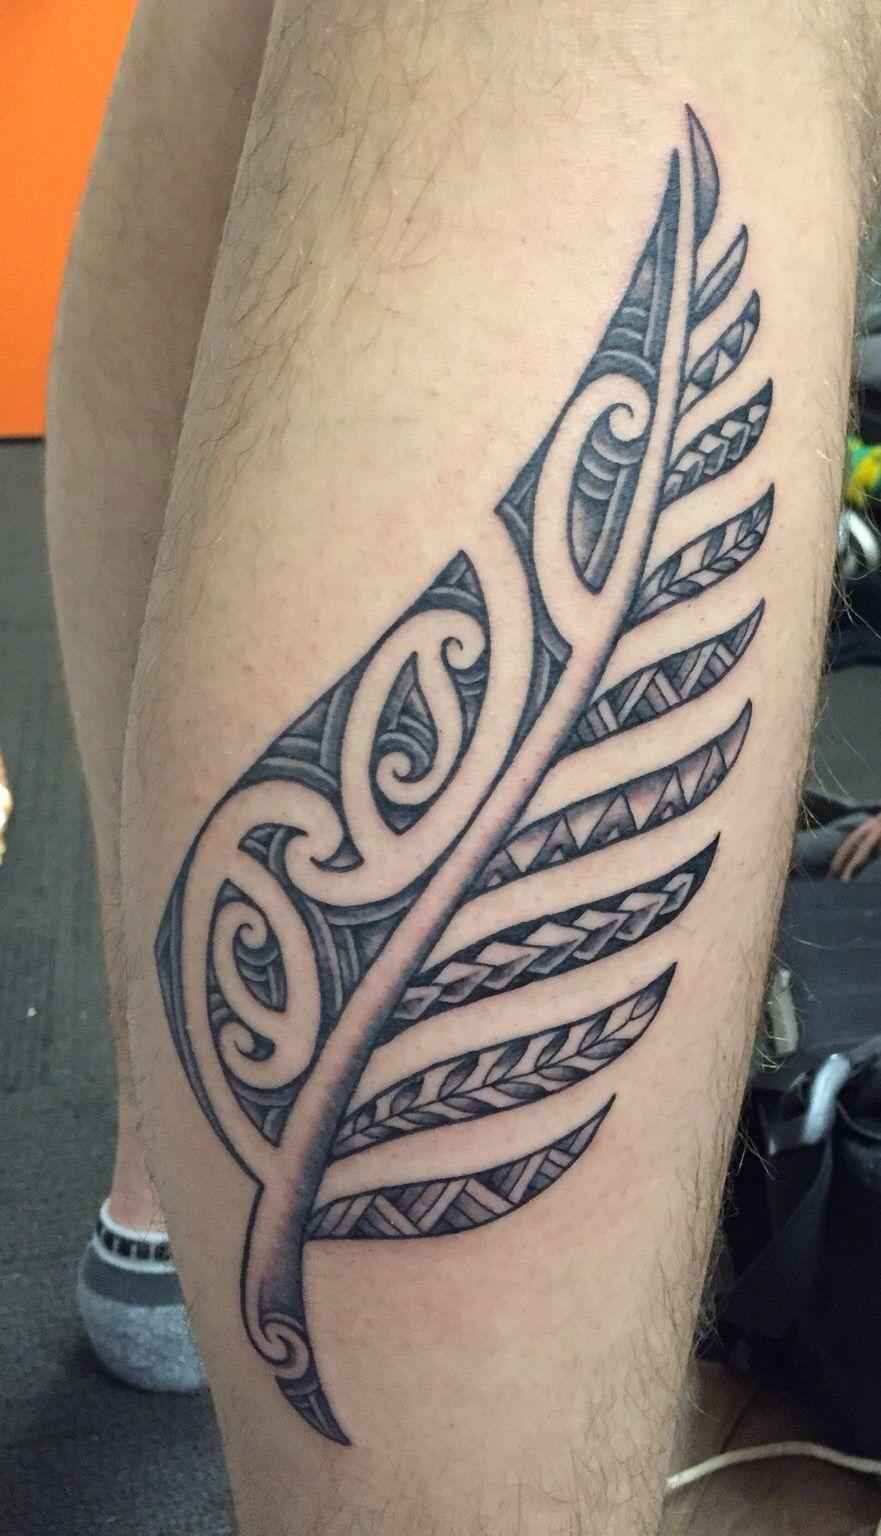 maori inspired silver fern tattoos pinterest maori. Black Bedroom Furniture Sets. Home Design Ideas